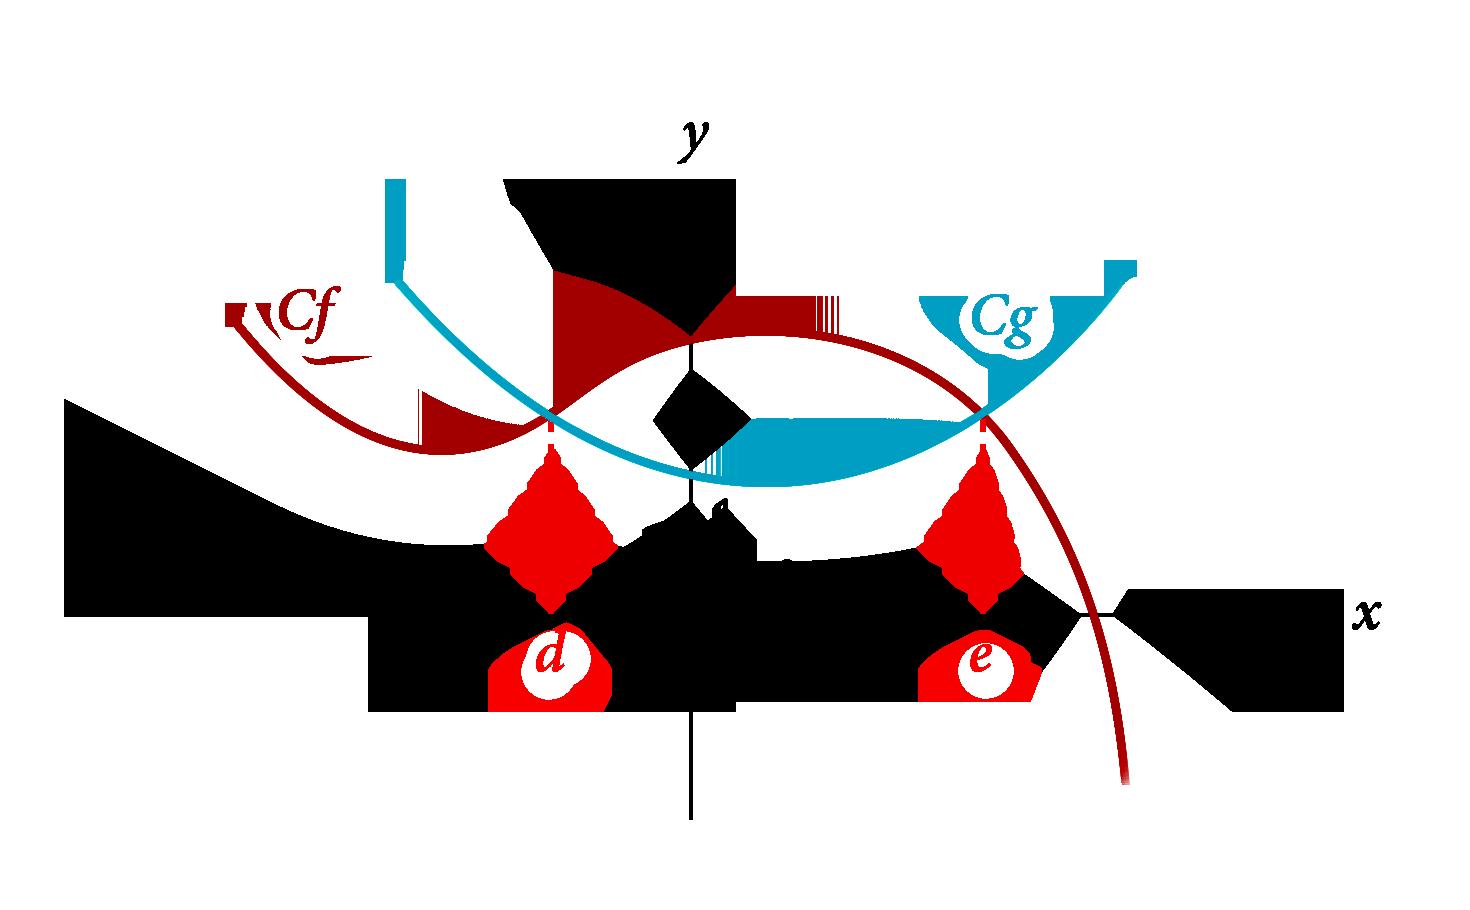 équation f(x)=g(x) fonctions